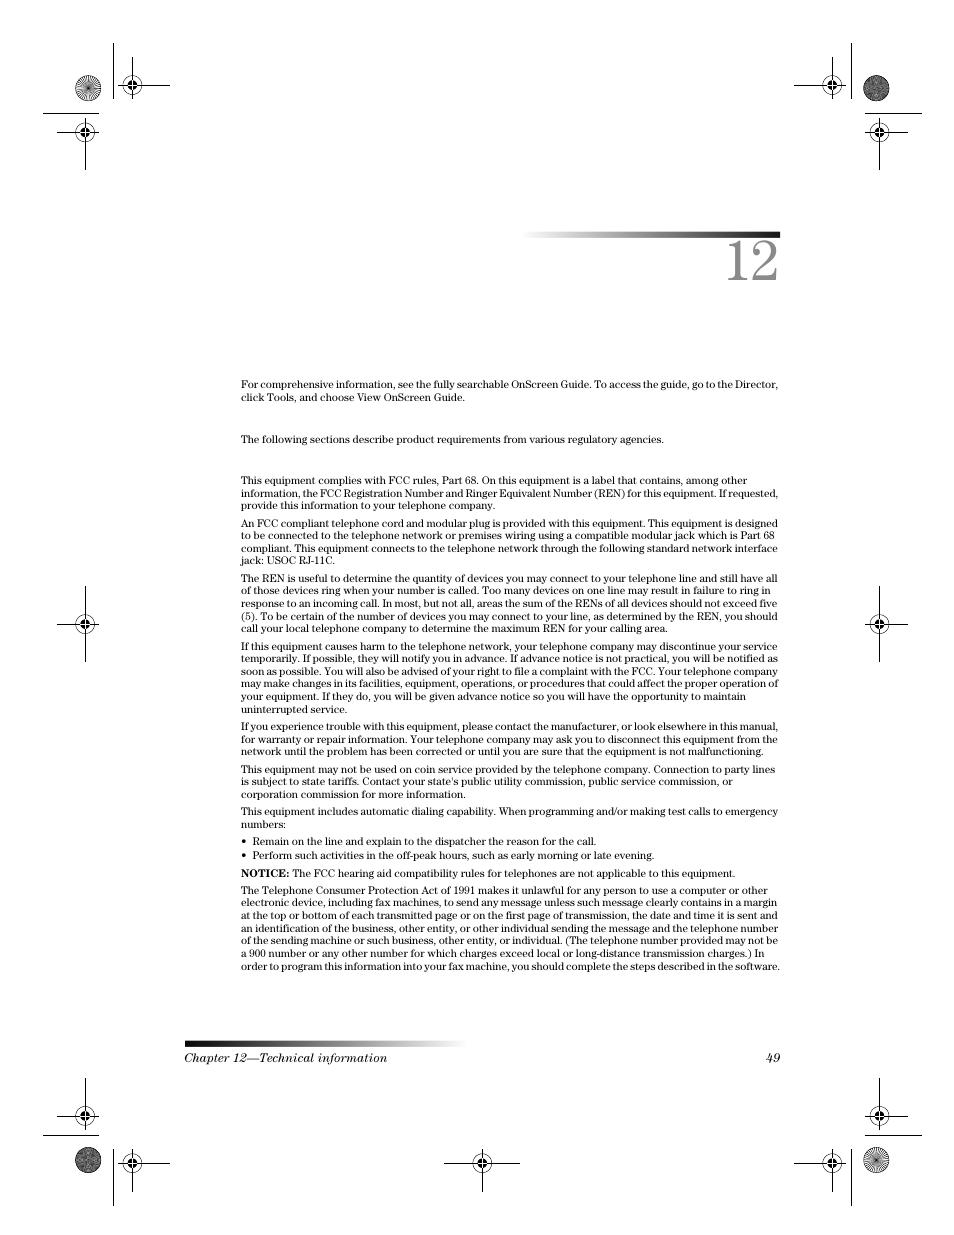 technical information hp c6734a user manual page 49 58 rh manualsdir com hp 49g manual hp vt 49 manual